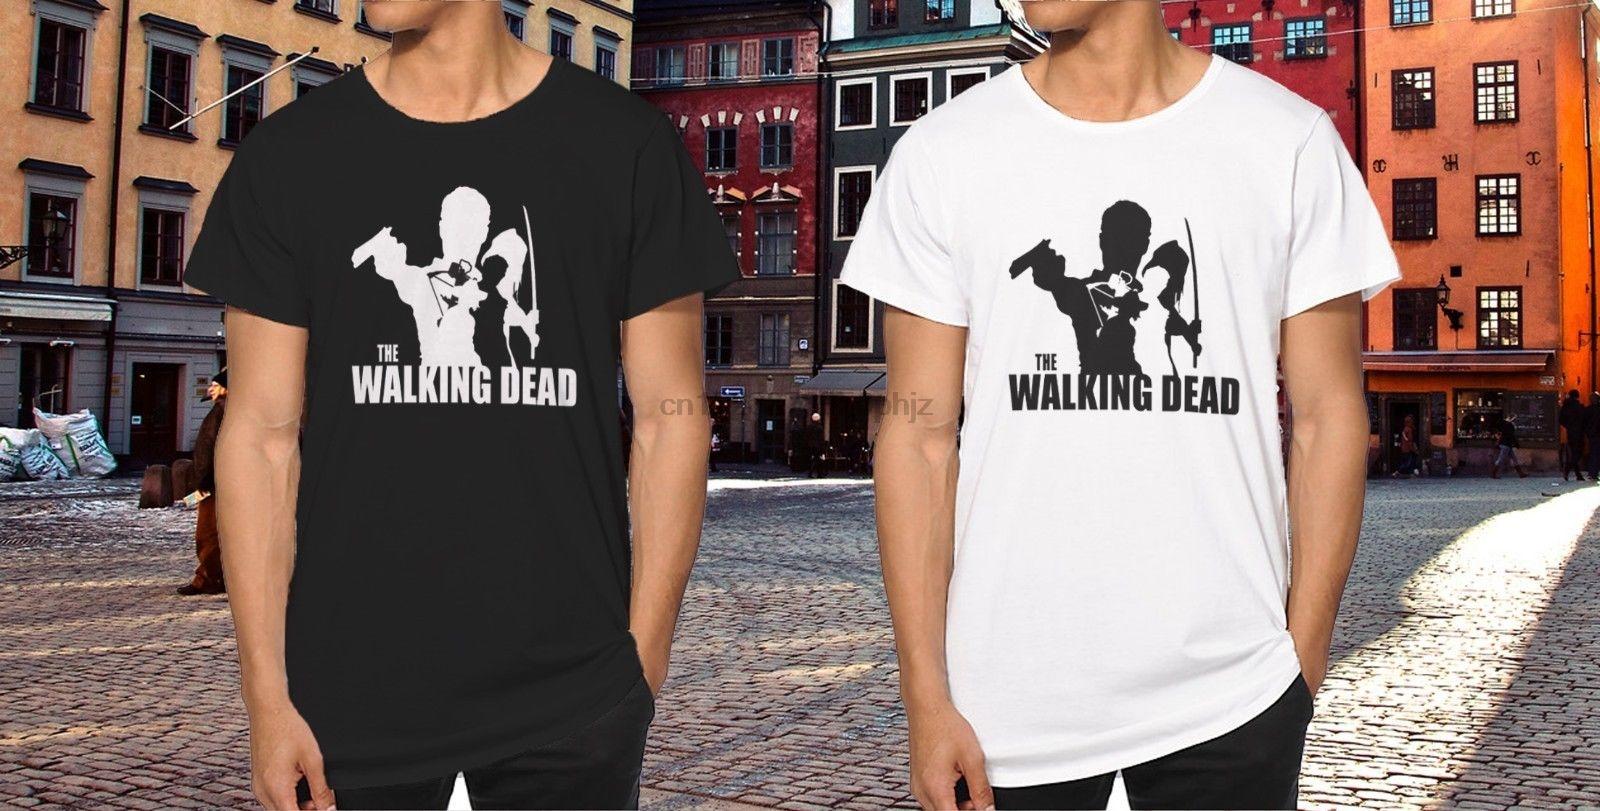 Games Fashion Designing Online Wholesale Distributors Games Fashion Designing For Sale Dhgate Mobile